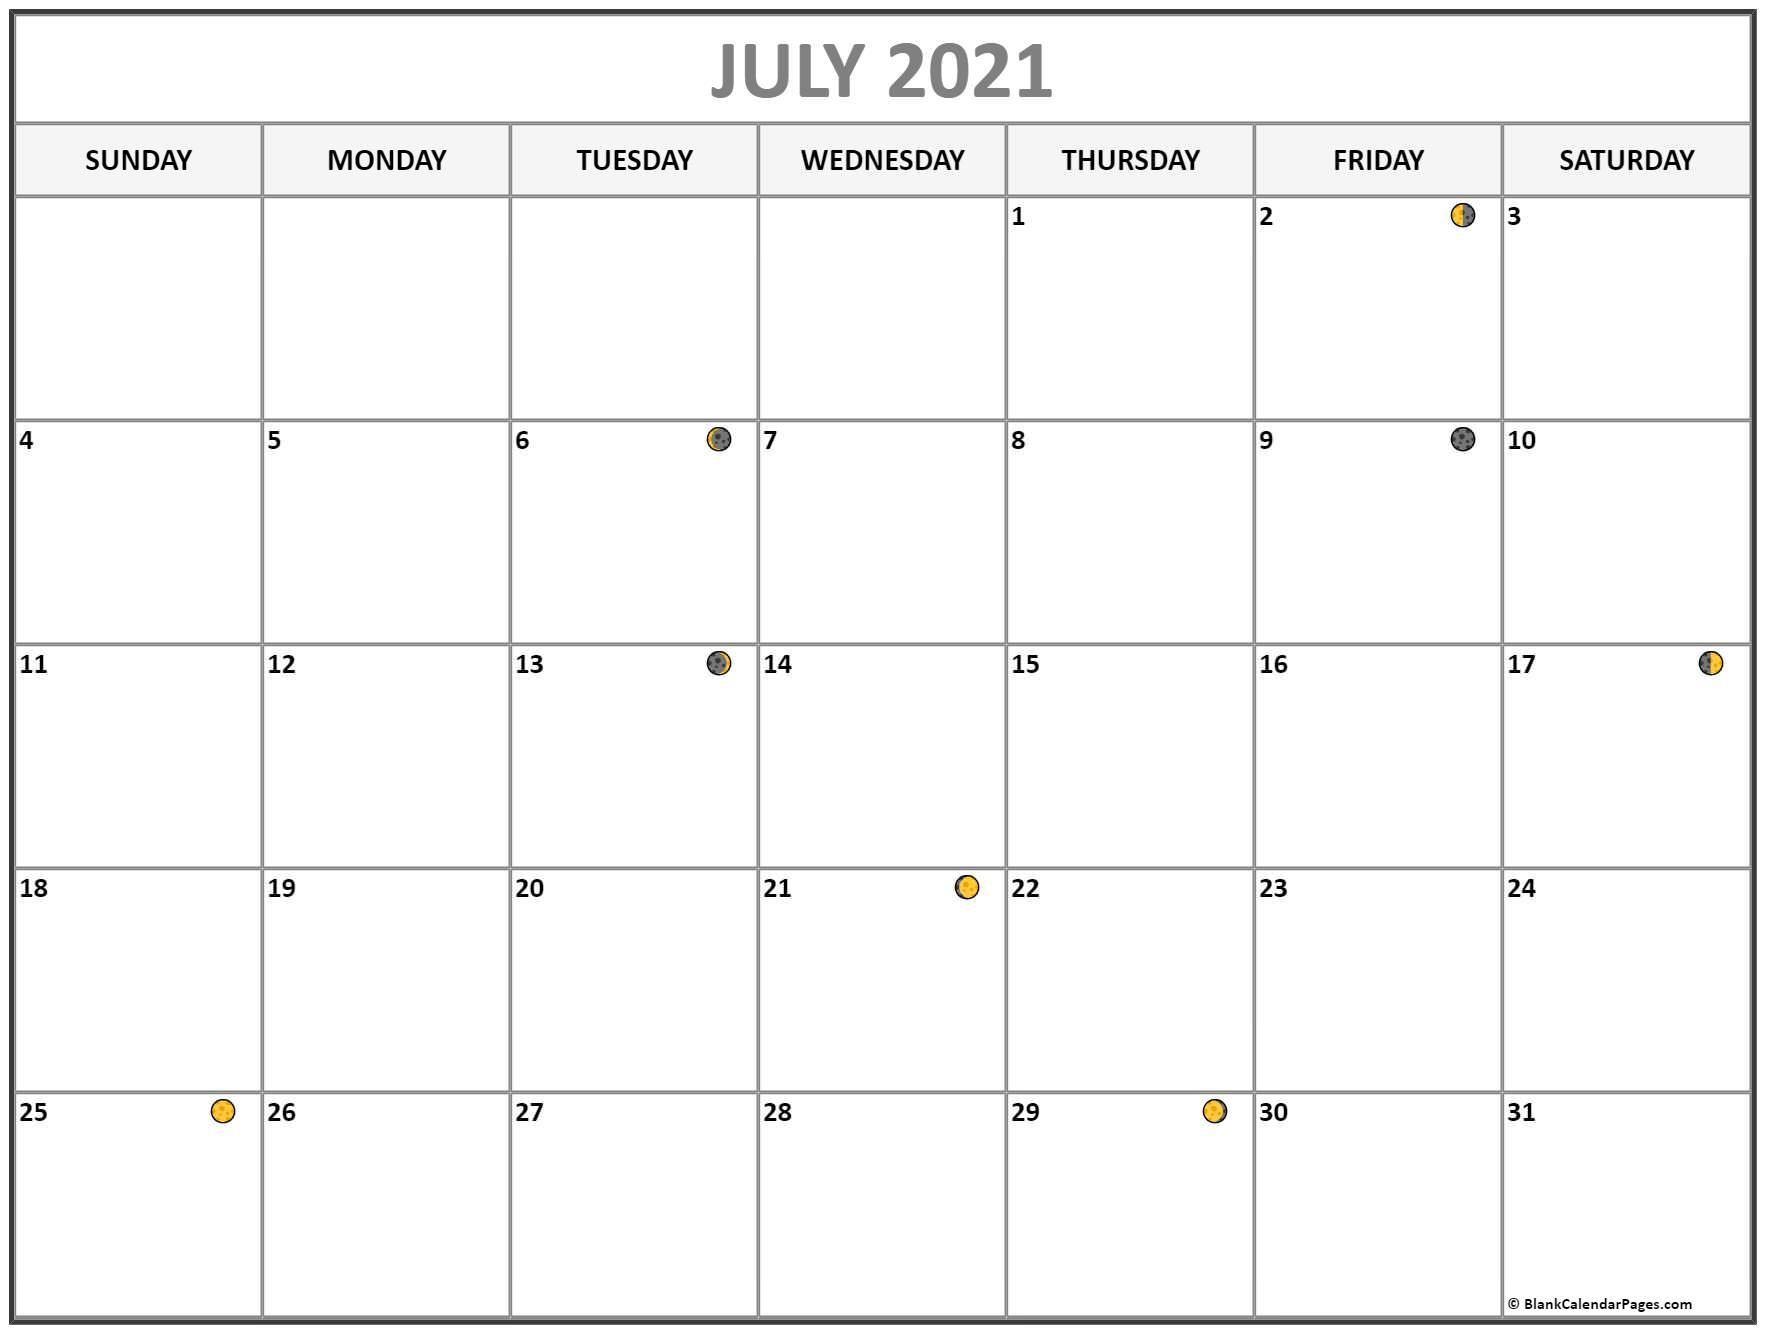 July 2021 Lunar Calendar | Moon Phase Calendar Intended For Moon Phase Deer Hunting Chart 2021